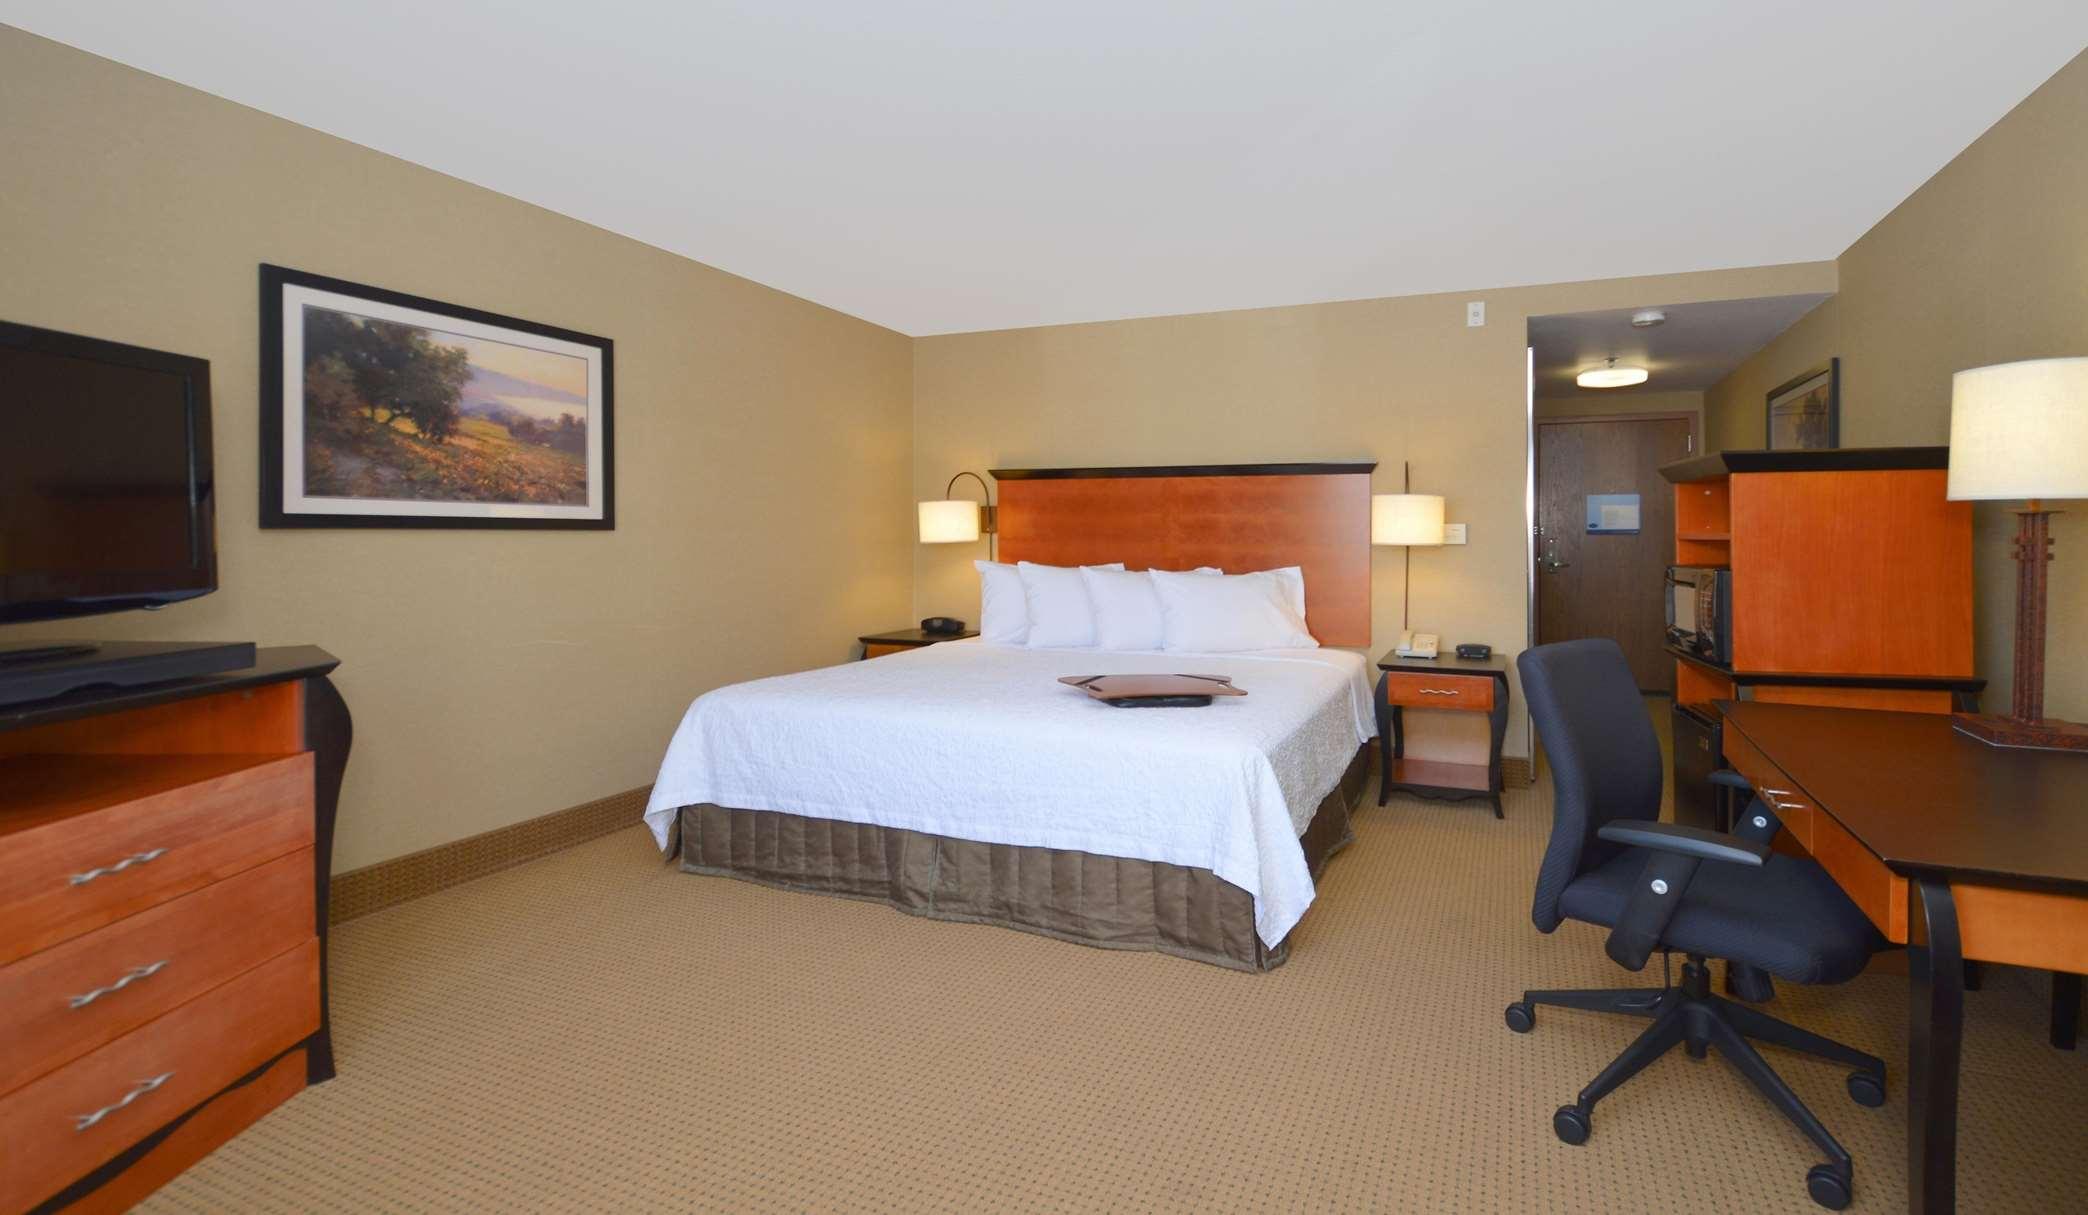 hampton inn suites carson city coupons near me in carson. Black Bedroom Furniture Sets. Home Design Ideas